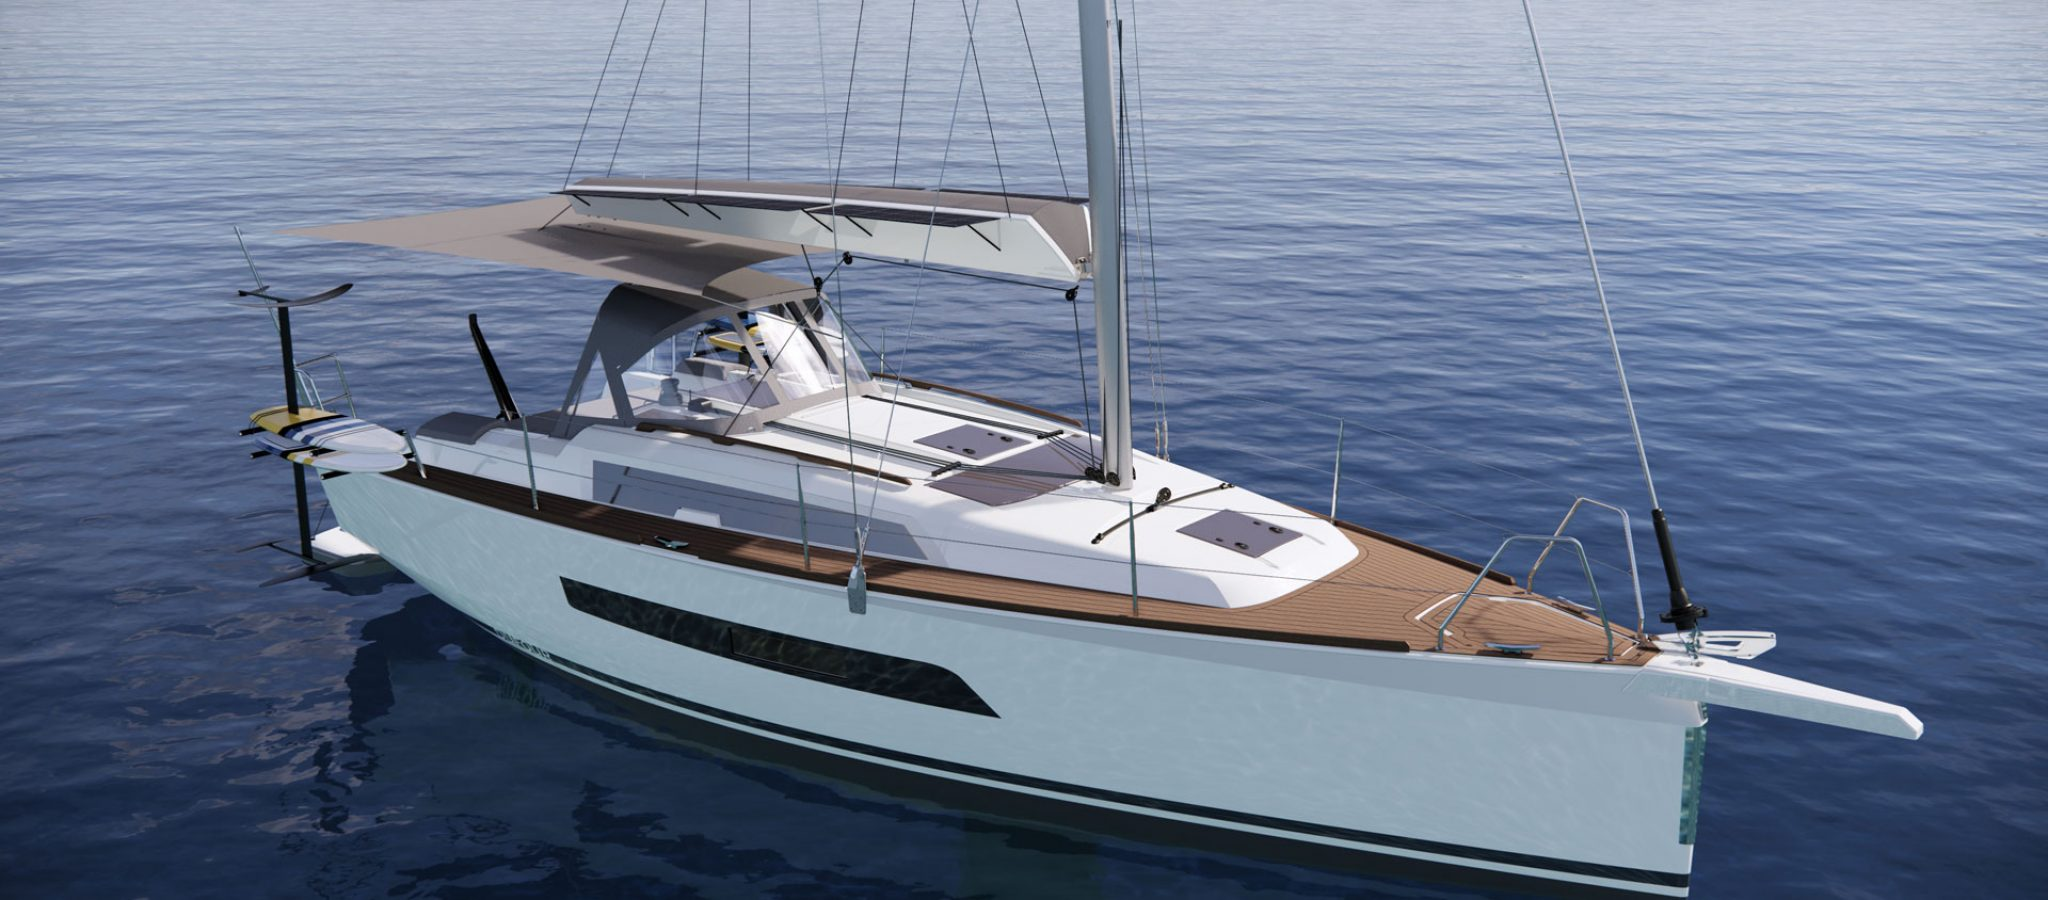 dufour-32-sailing-yacht-luxury-1